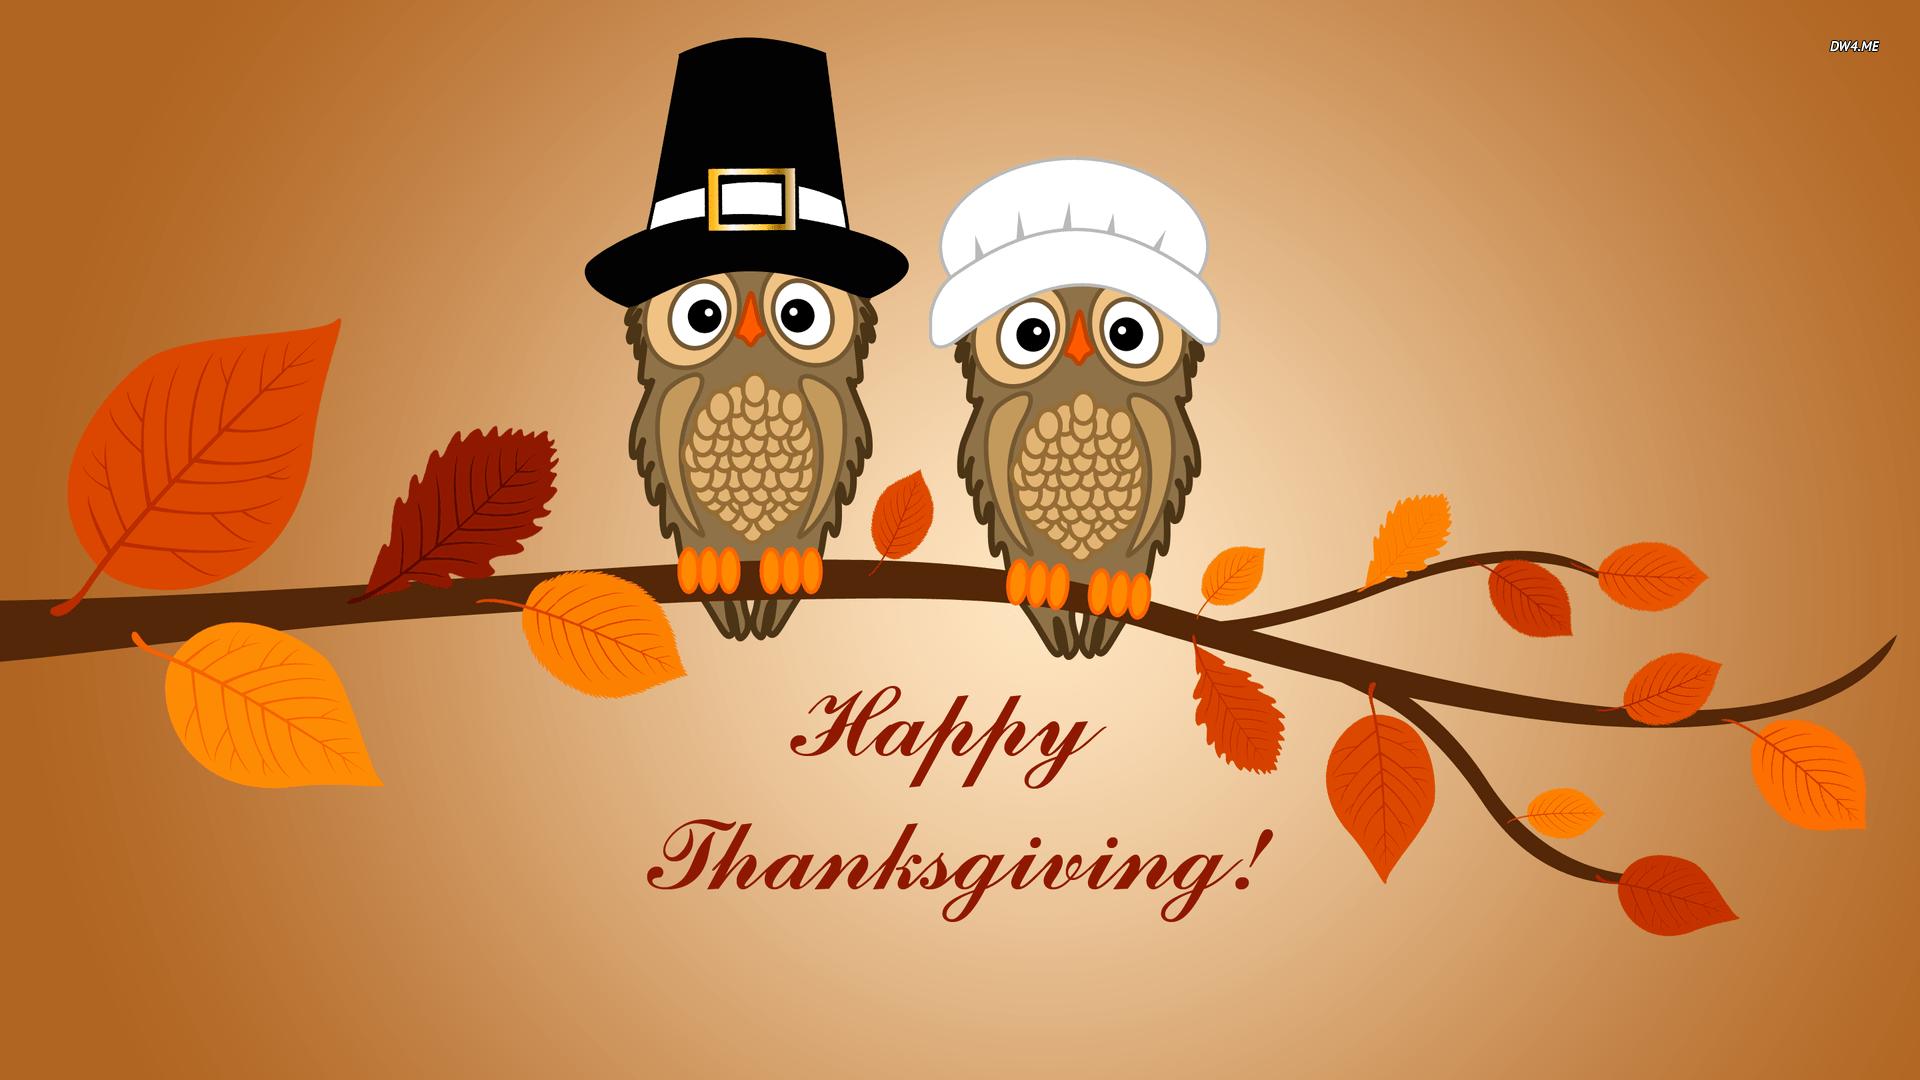 Happy Thanksgiving Wallpaper 1920X1080